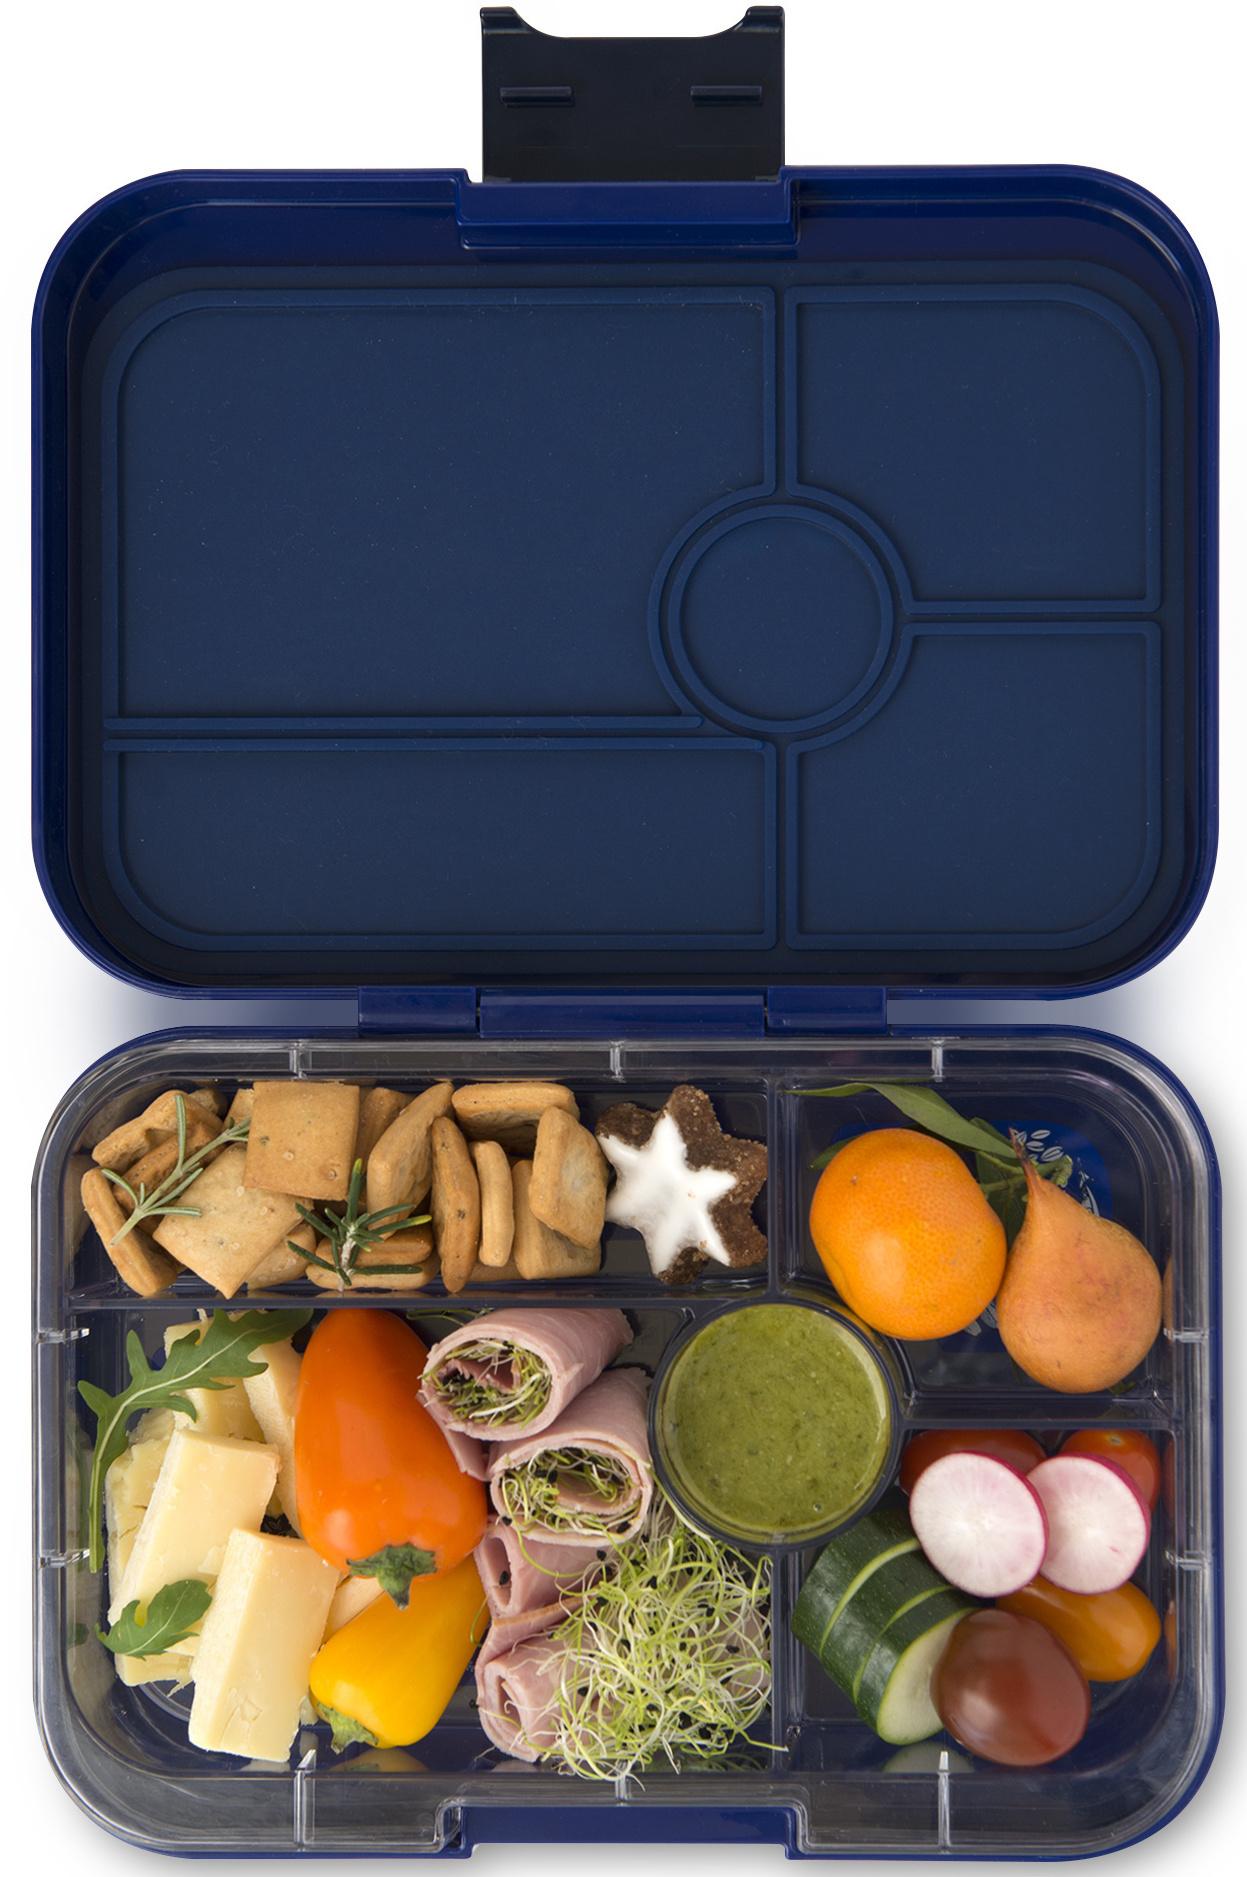 Yumbox Tapas XL lunchtrommel Portofino blauw / Bon appetit tray 5-vakken-2